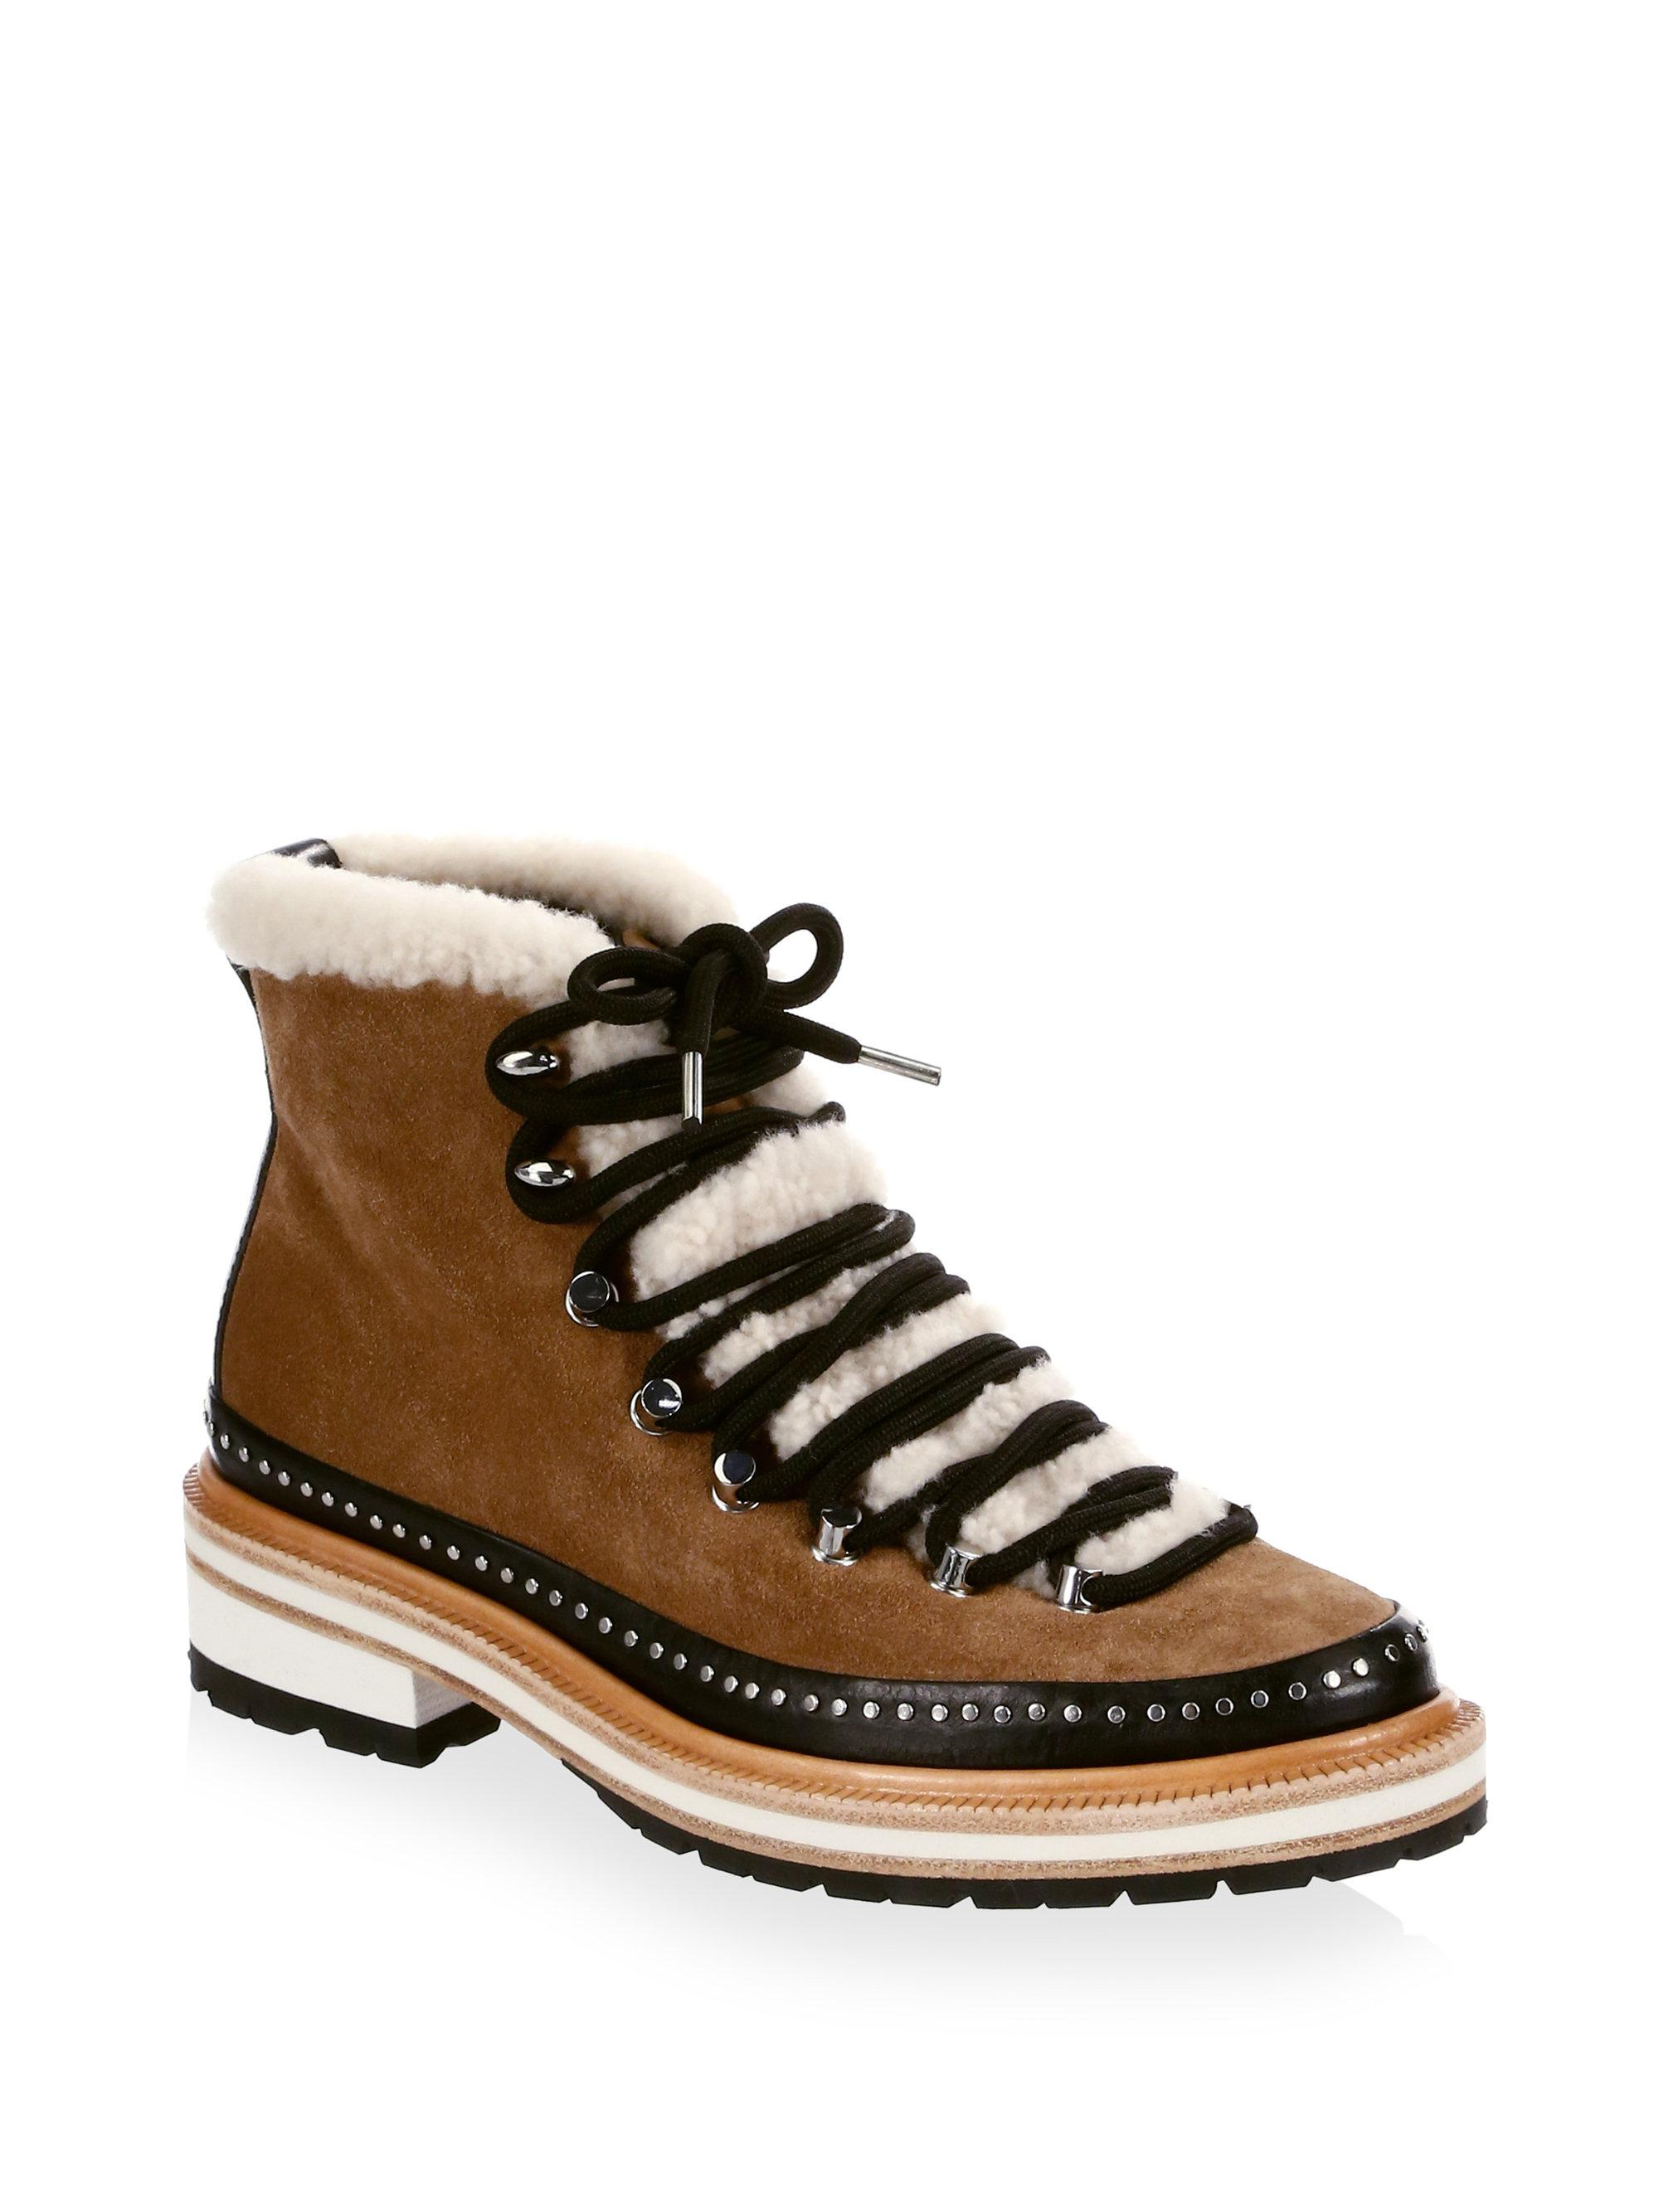 Rag and Bone Rag & Bone Brown Suede & Shearling Compass Boots Jeu Geniue Stockiste ETRX5A